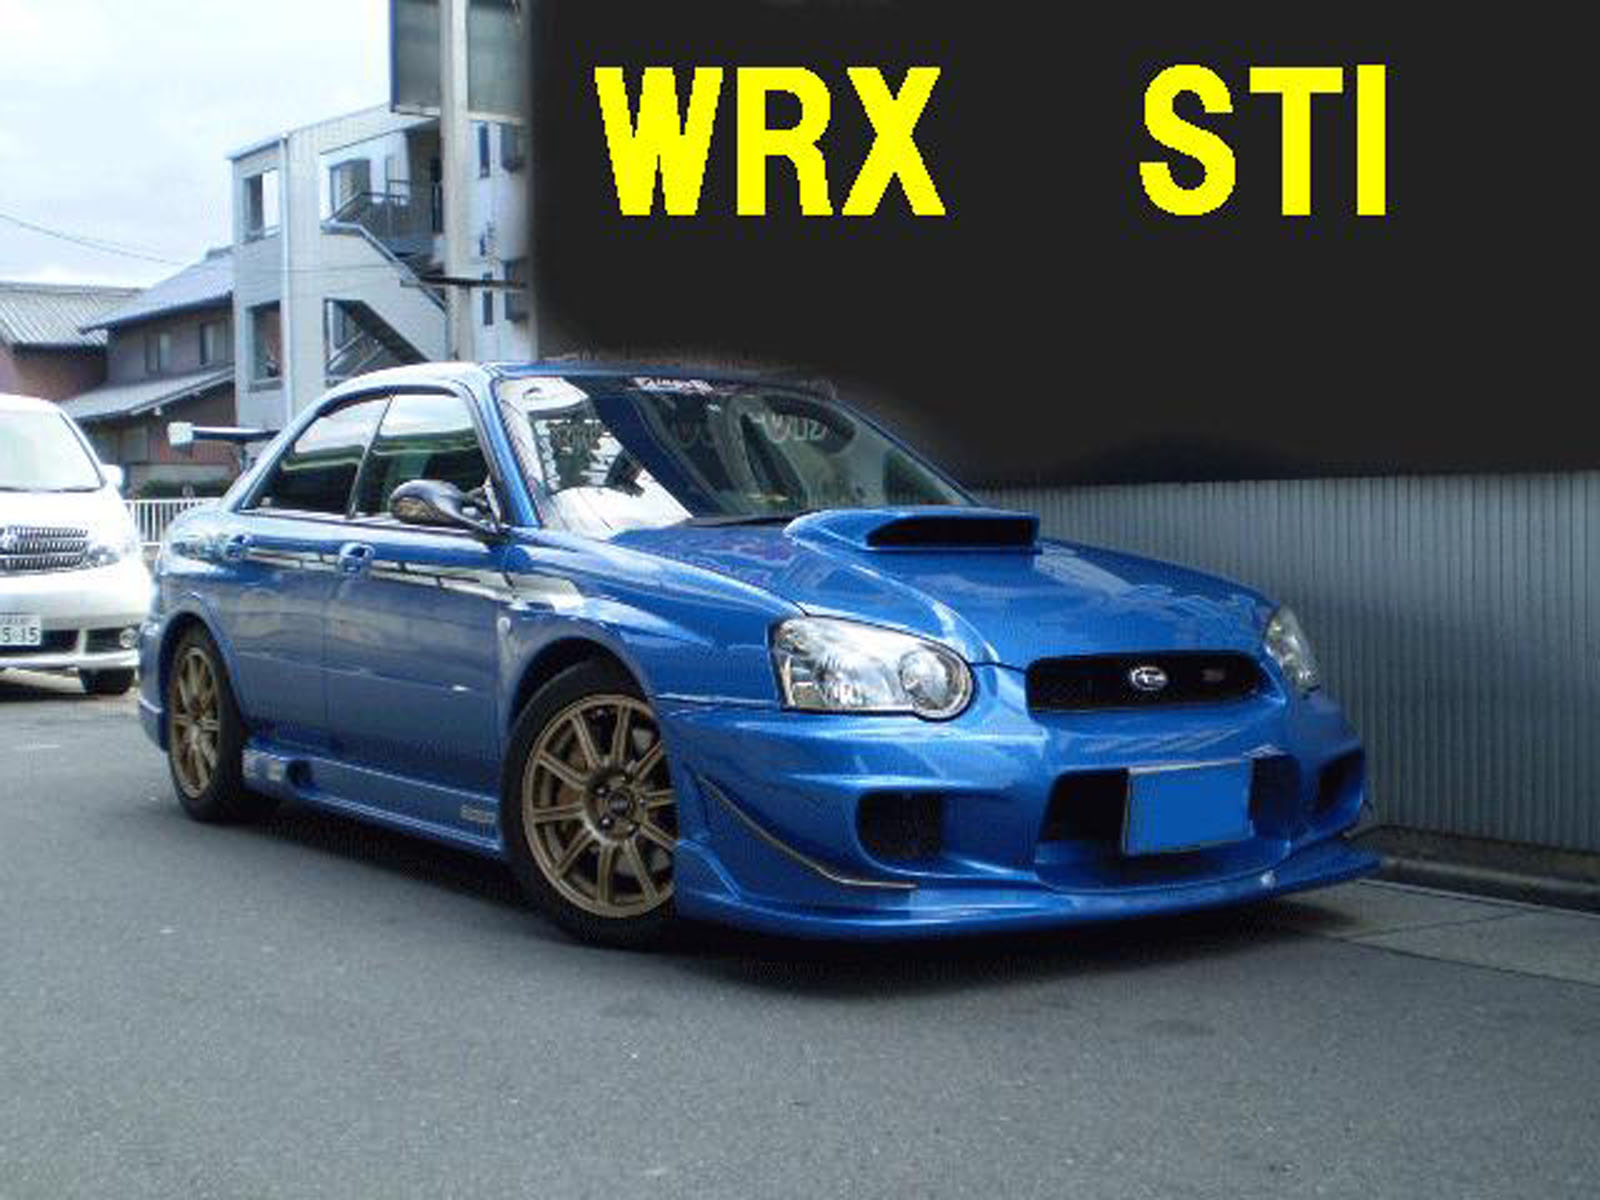 2004 Subaru Impreza WRX Sti For Sale